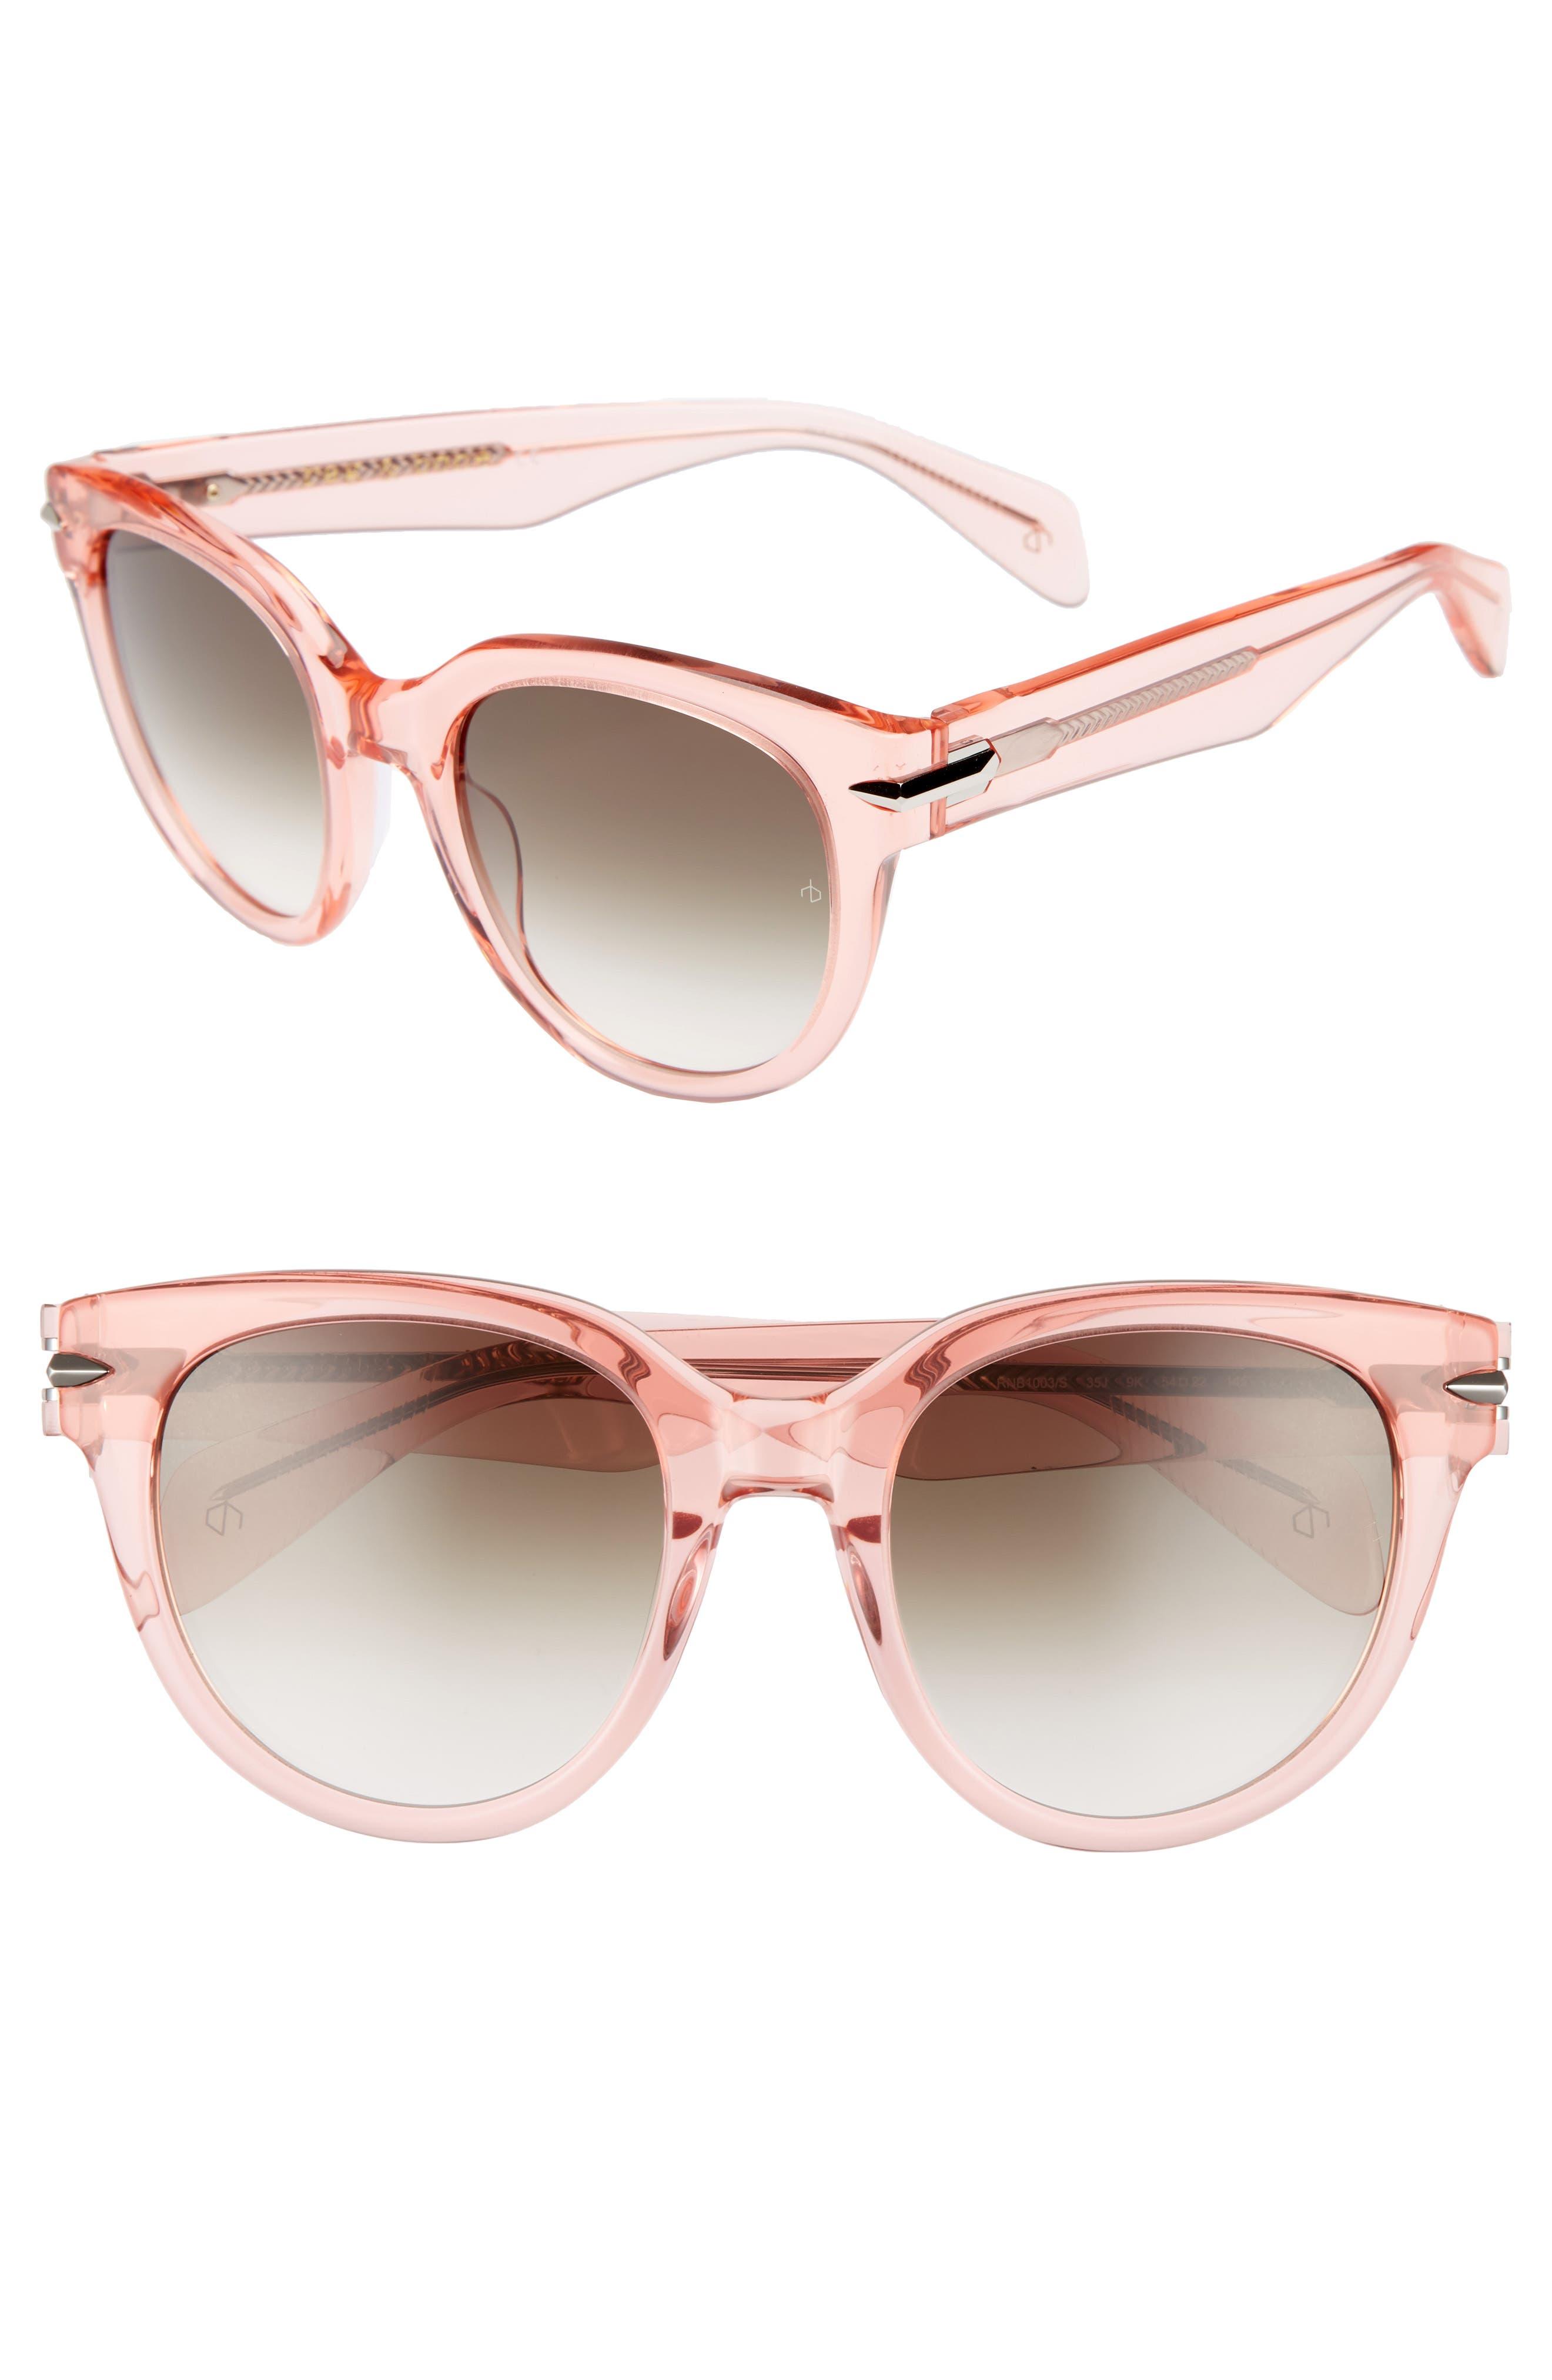 54mm Cat Eye Sunglasses,                             Main thumbnail 1, color,                             PINK